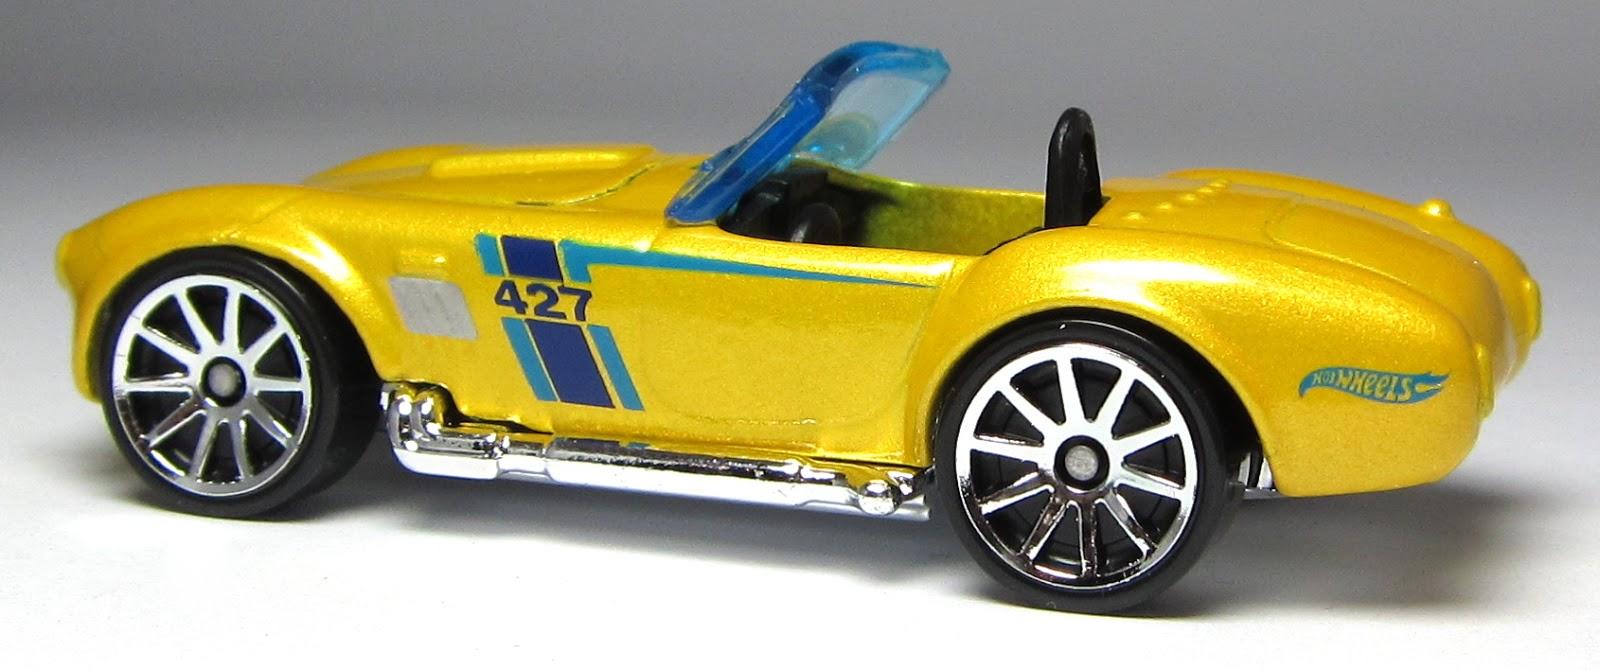 Shelby cobra 427 s c